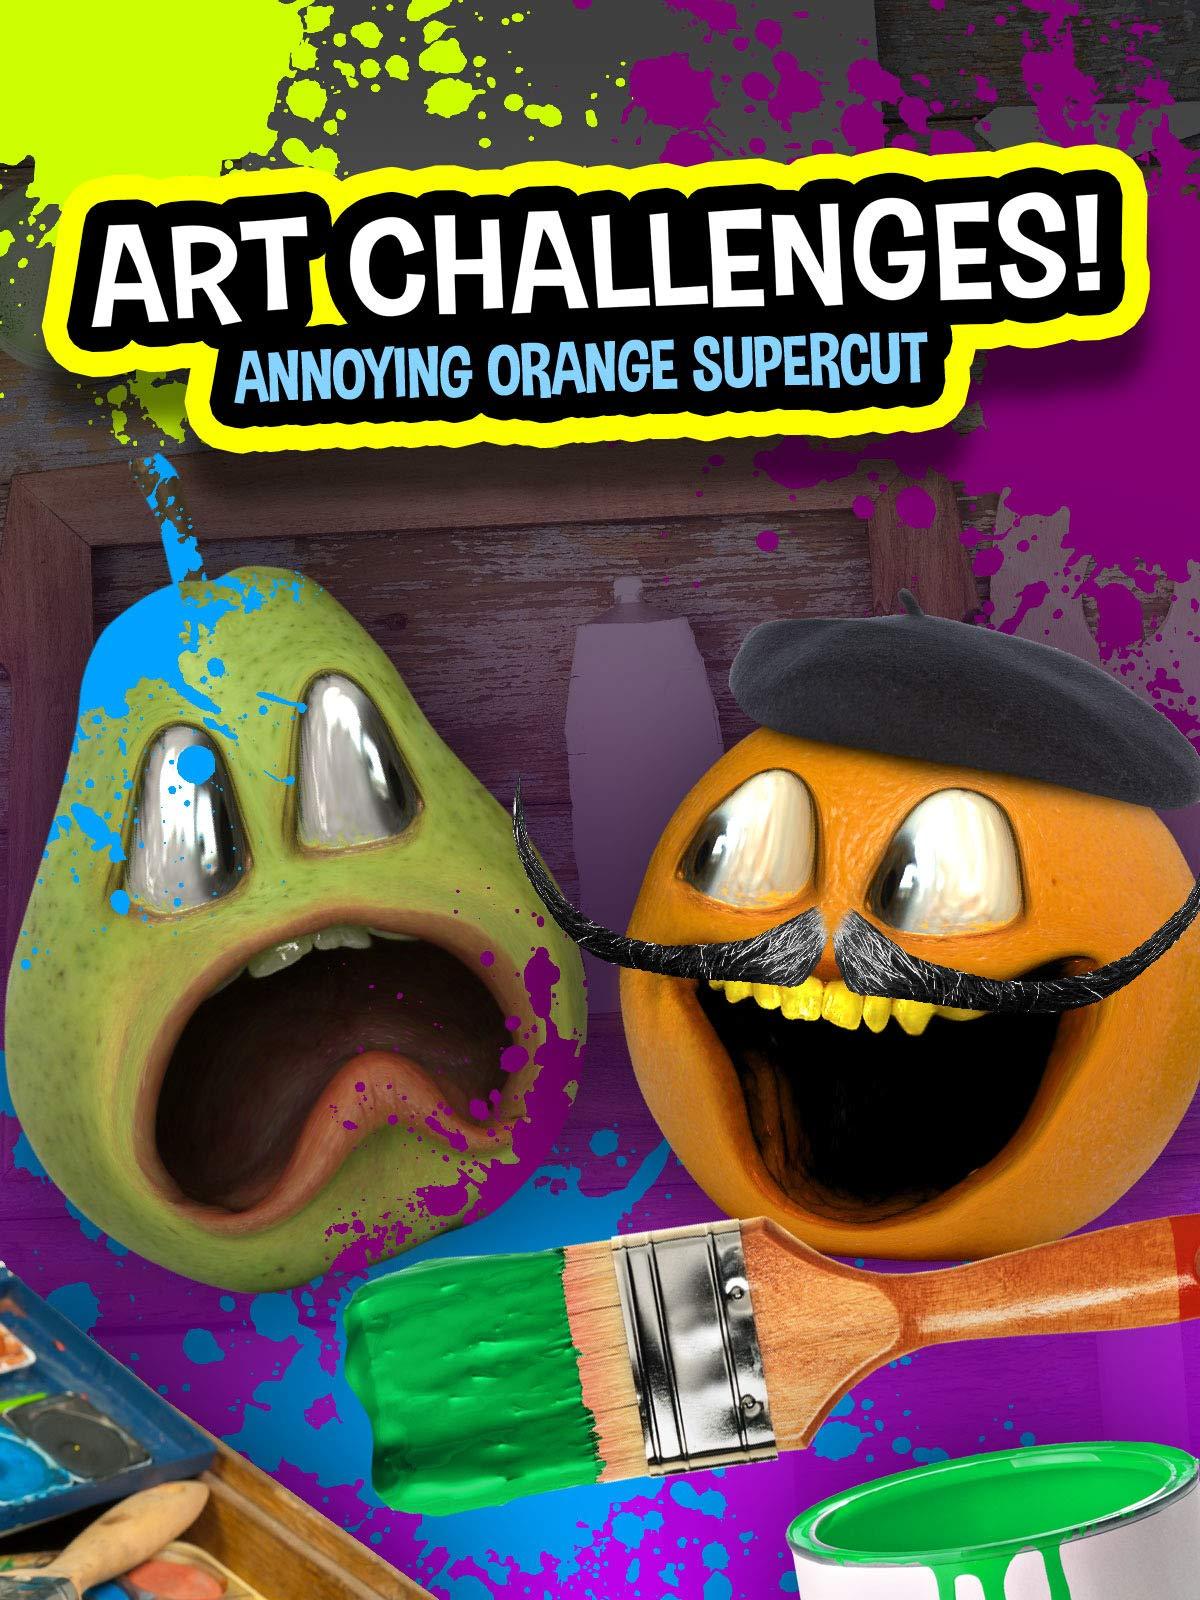 Art Challenges (Annoying Orange Supercut)